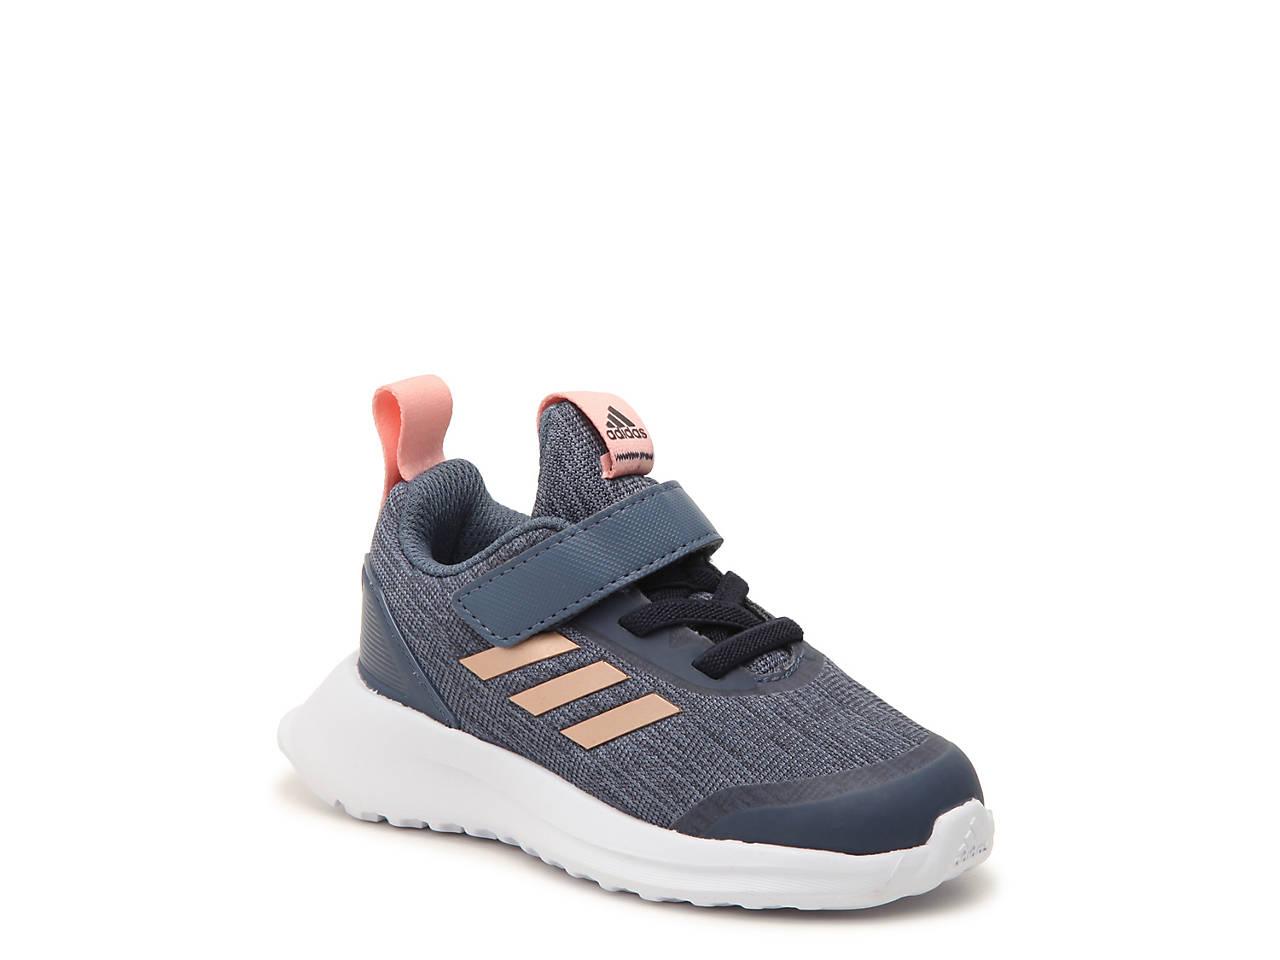 RapidaRun X Sneaker Kids'